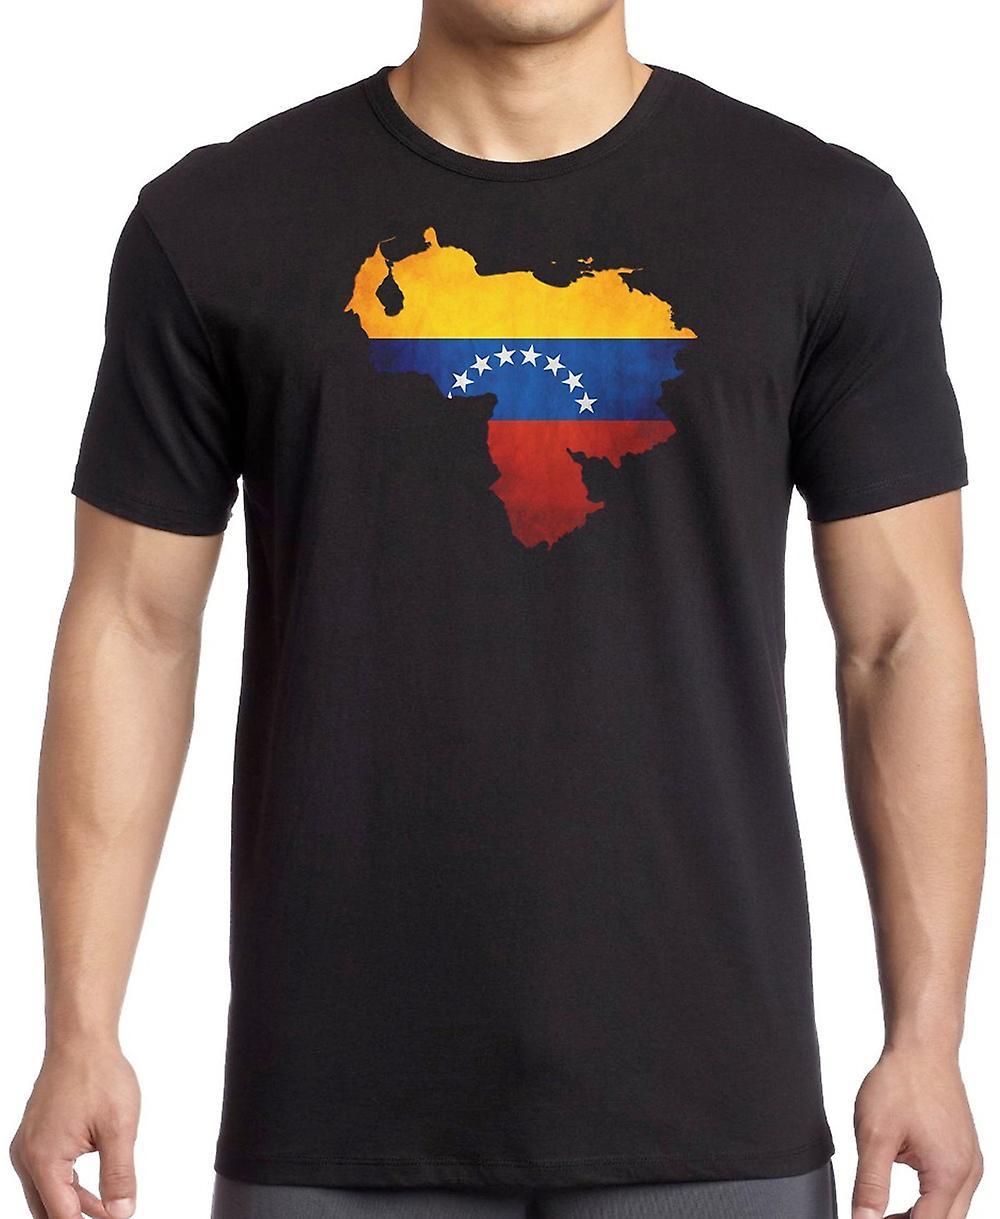 Venezuela bandera mapa niños T Shirt